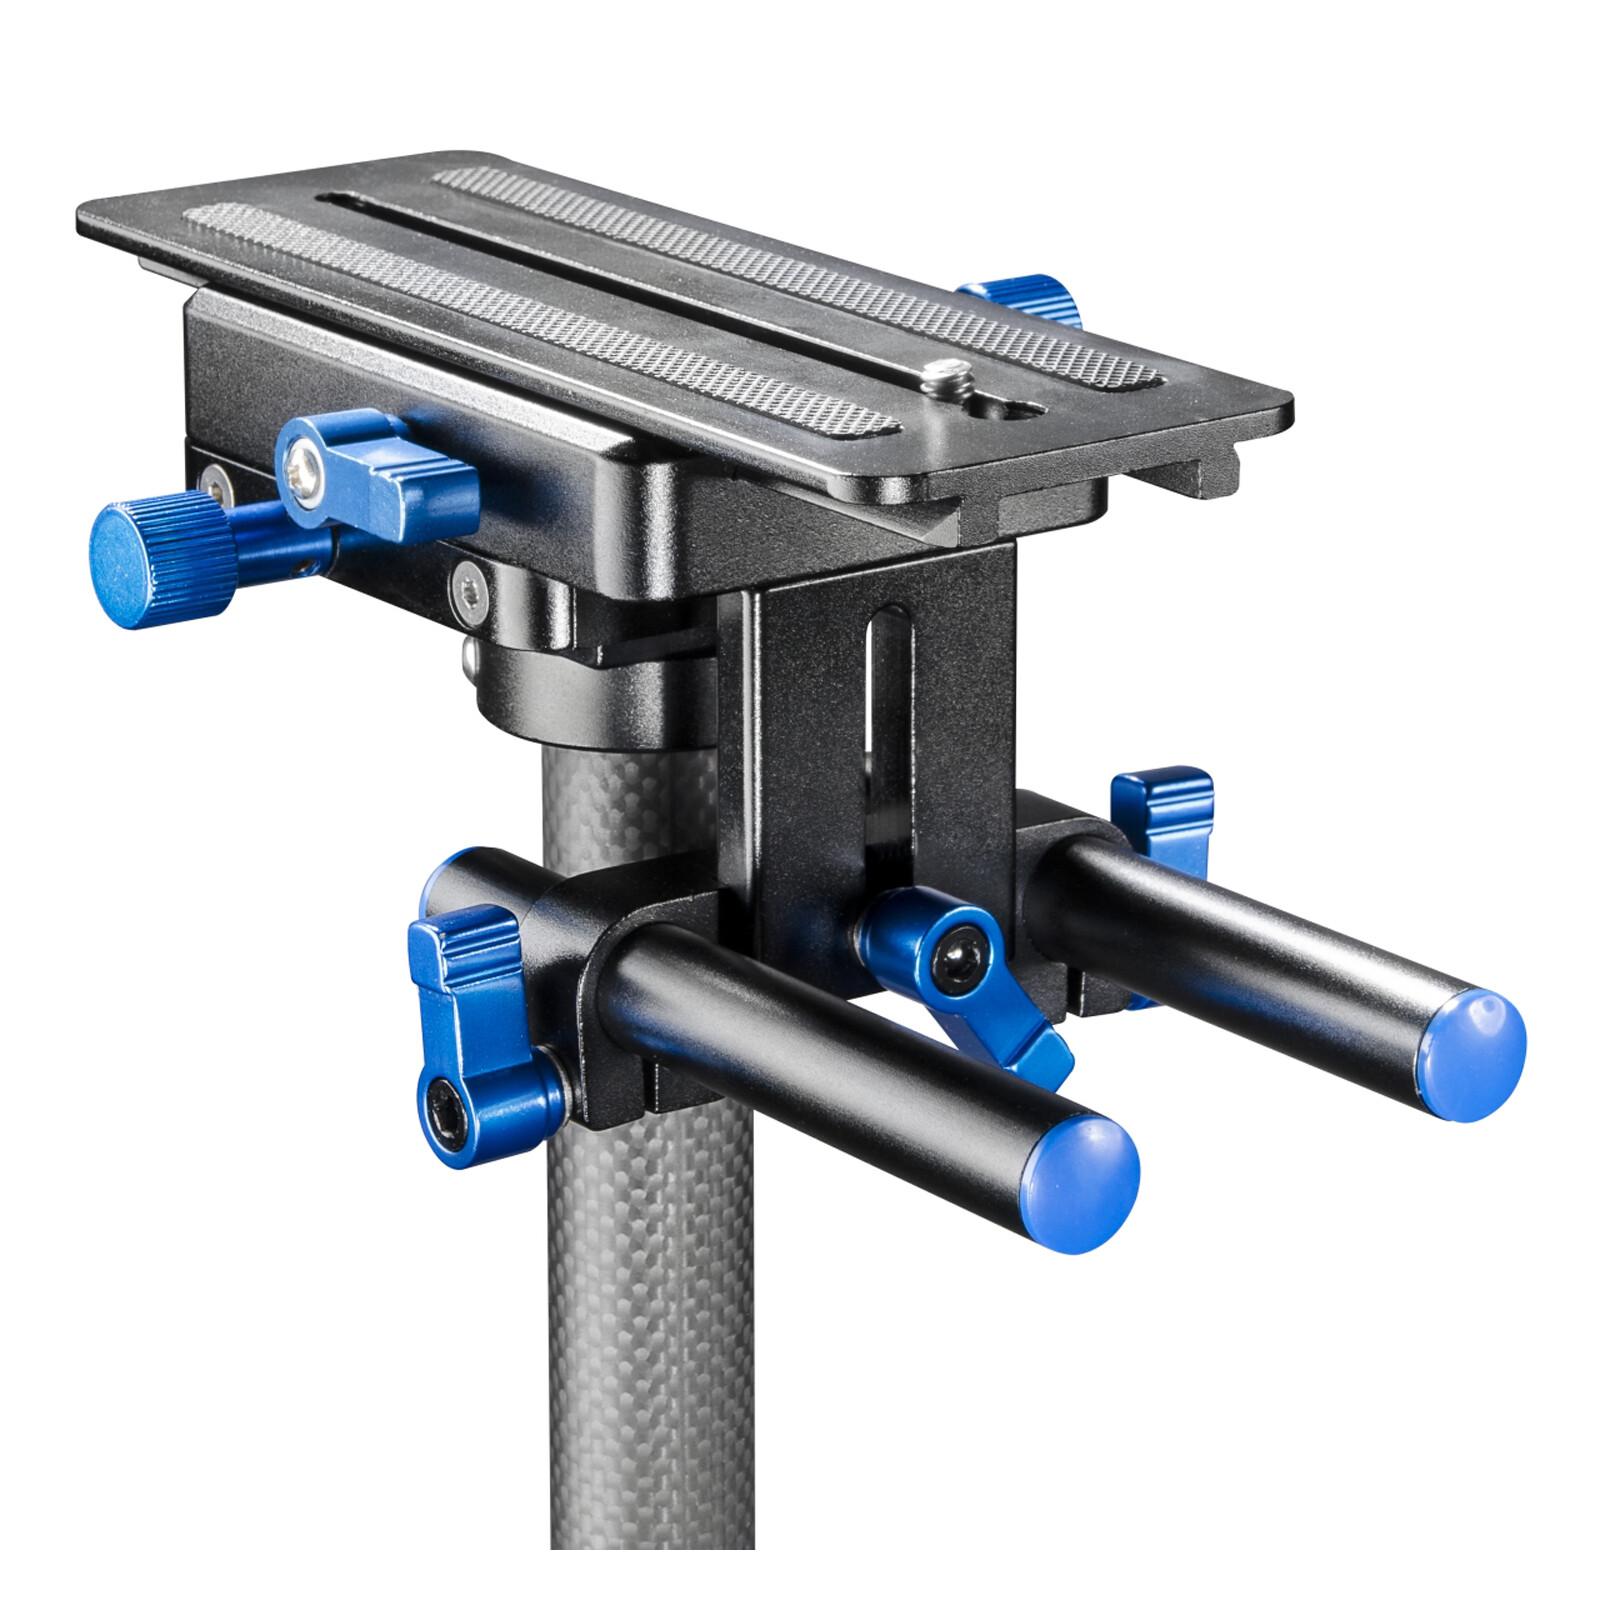 walimex pro Schwebestativ StabyPod Carbon 120cm